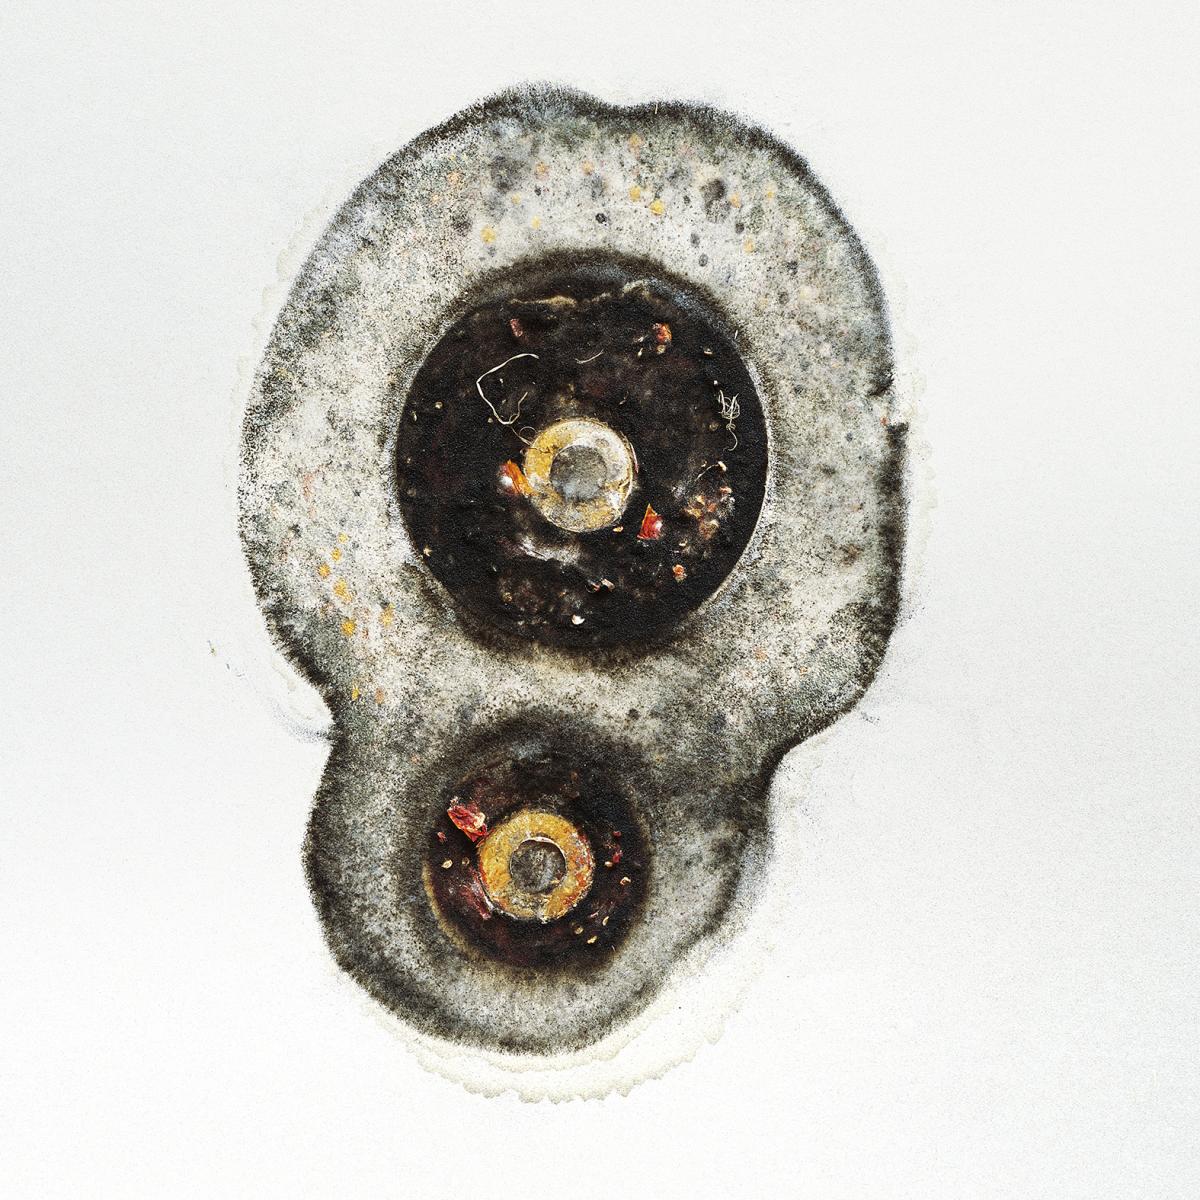 Filip Berendt, Pandemic II, 2009, photography archival print on dibond ed.62AP, 50×50 cm